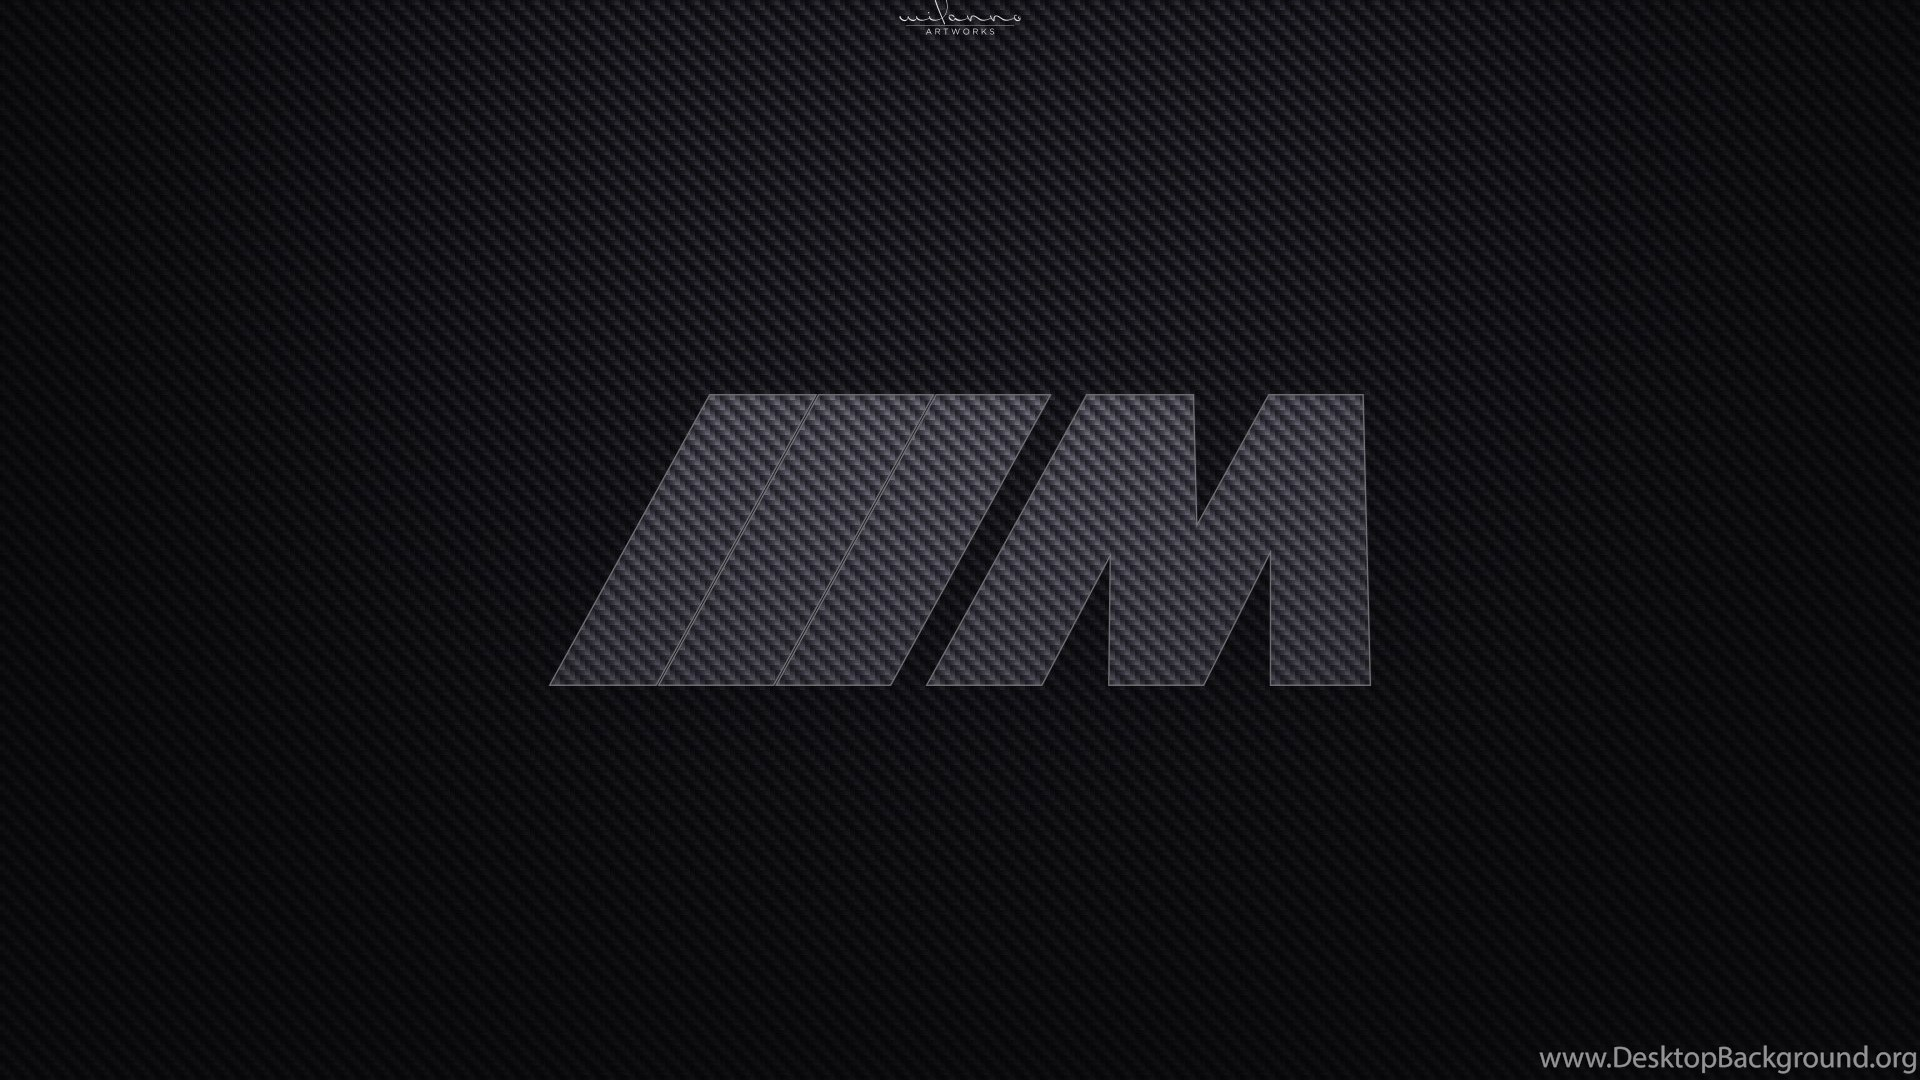 Bmw Logo Iphone Wallpapers Image Desktop Background